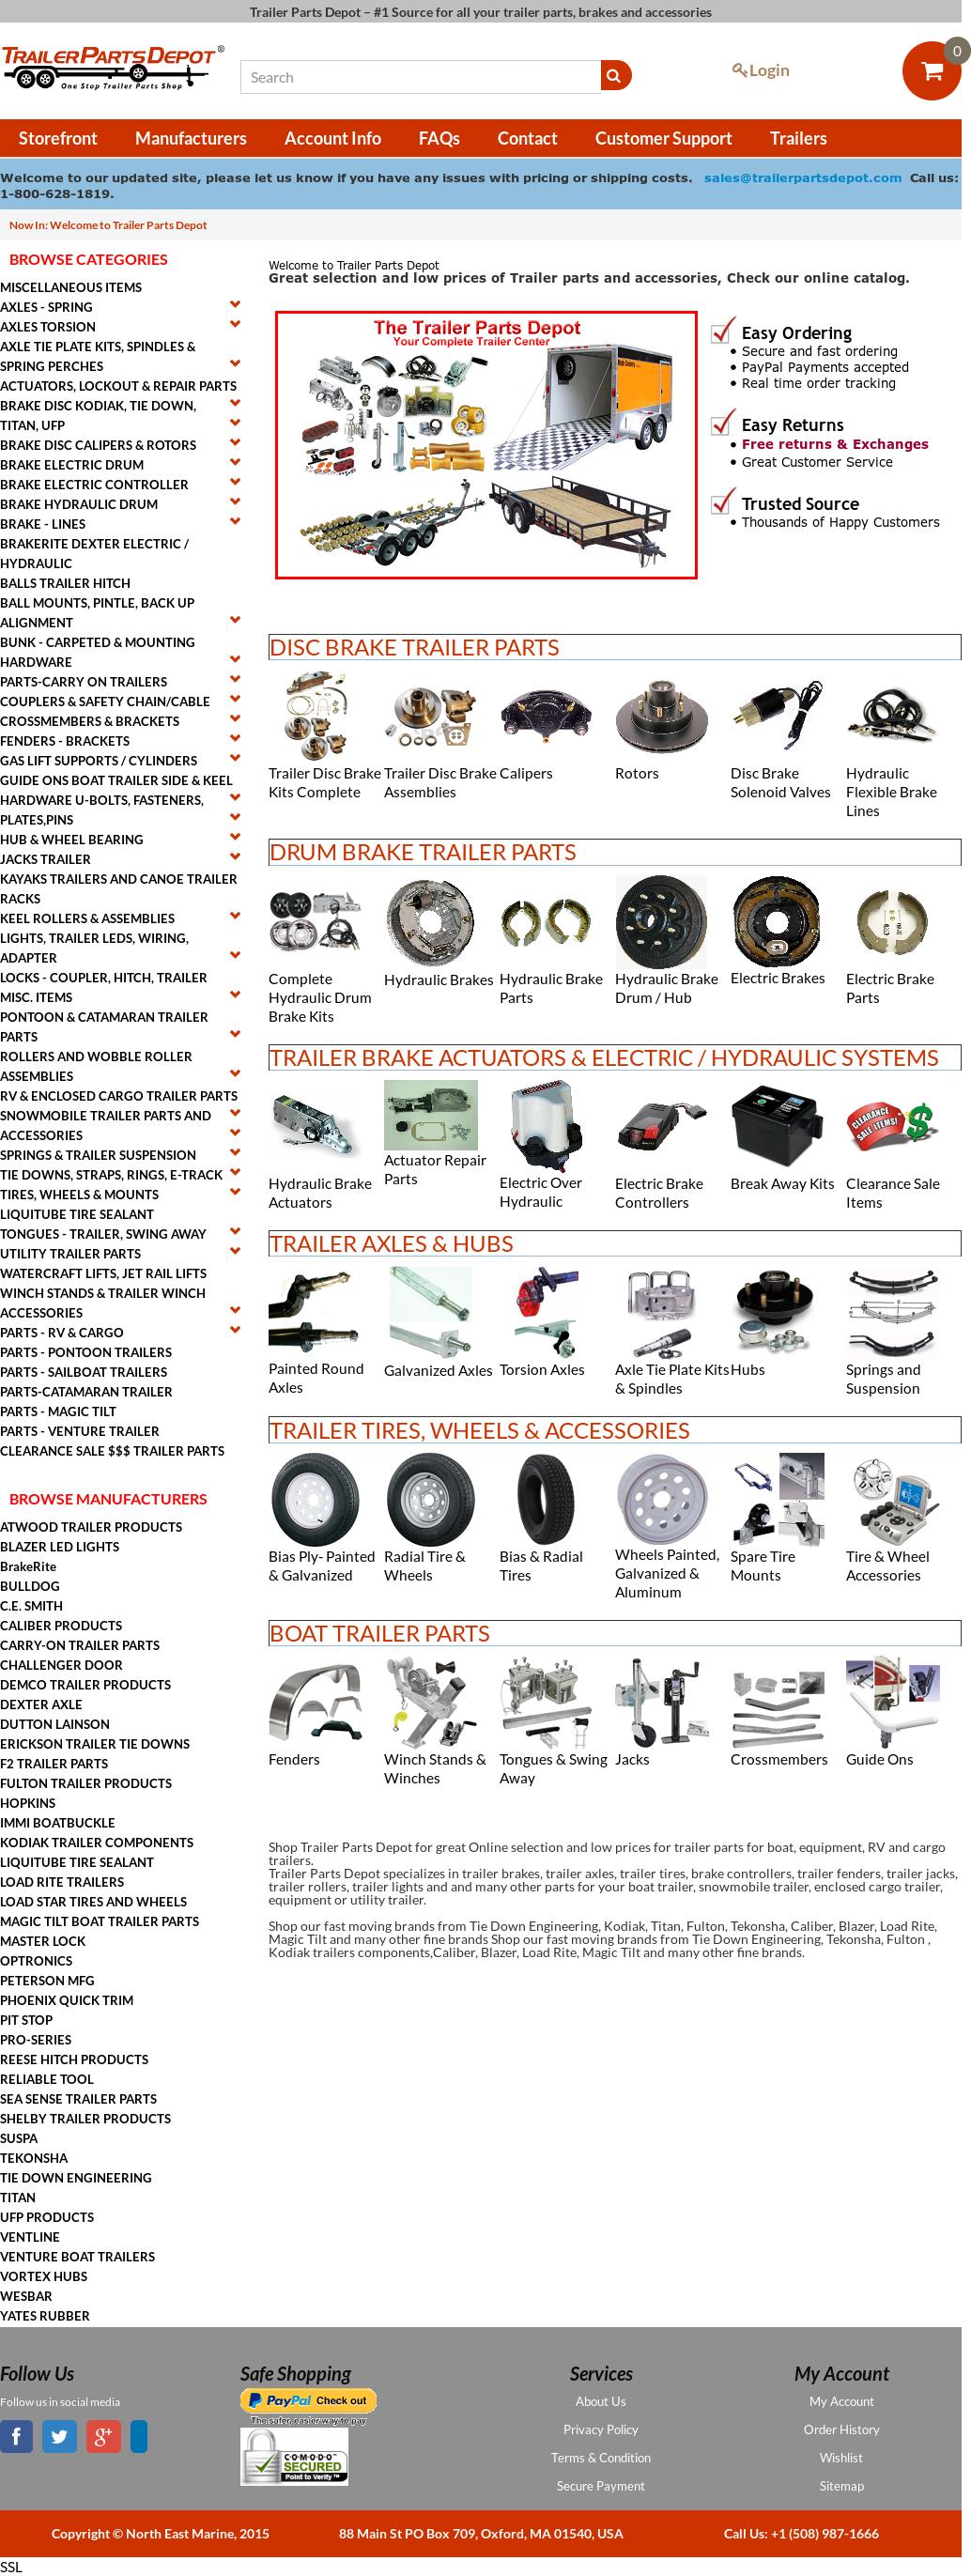 Centro Del Materasso Carmagnola.Trailer Parts Depot Competitors Revenue And Employees Owler